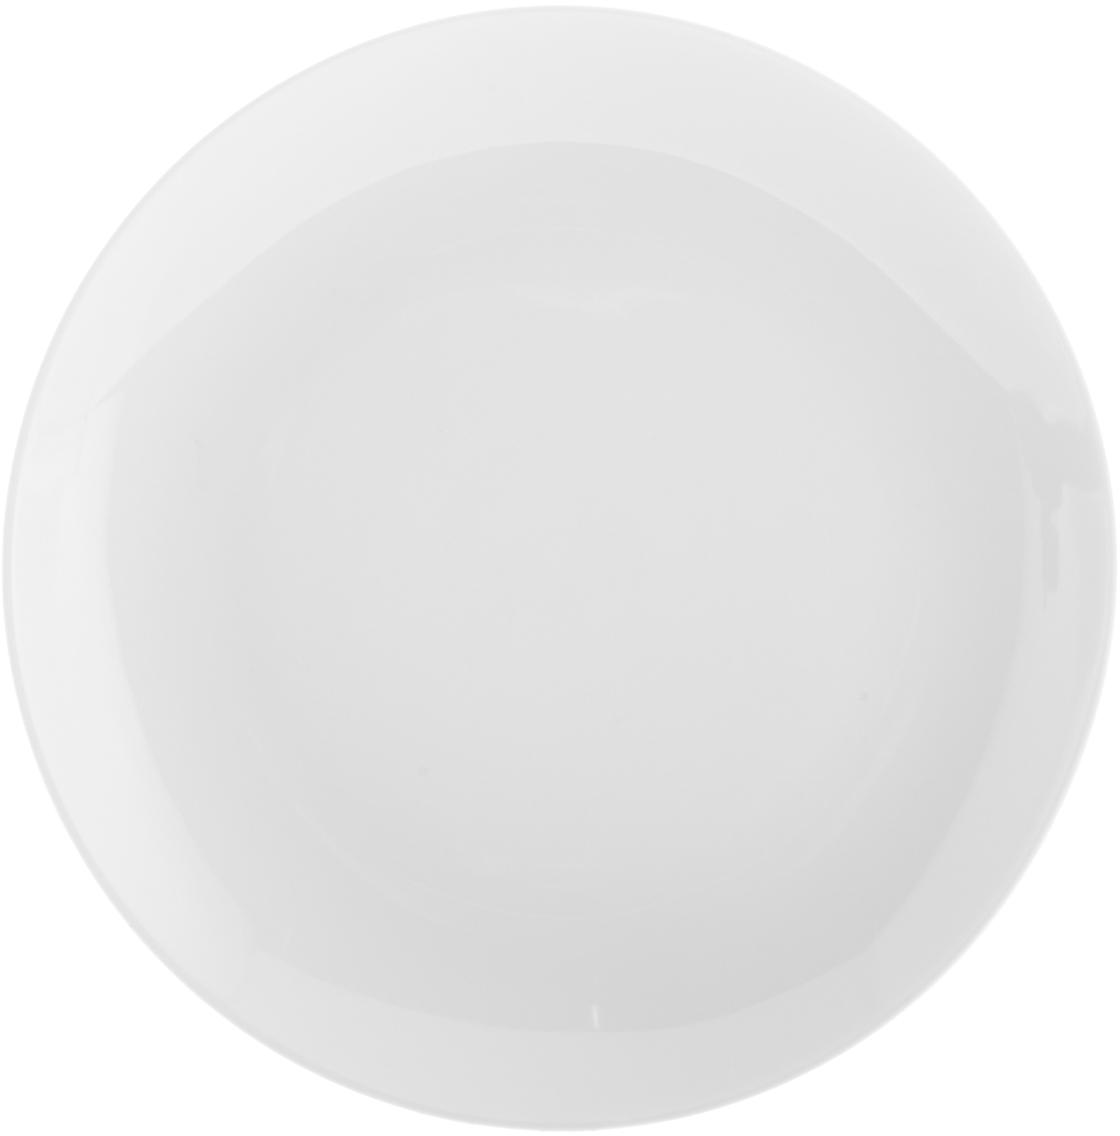 Platos de postre de porcelana Delight Modern, 2uds., Porcelana, Blanco, Ø 20 cm